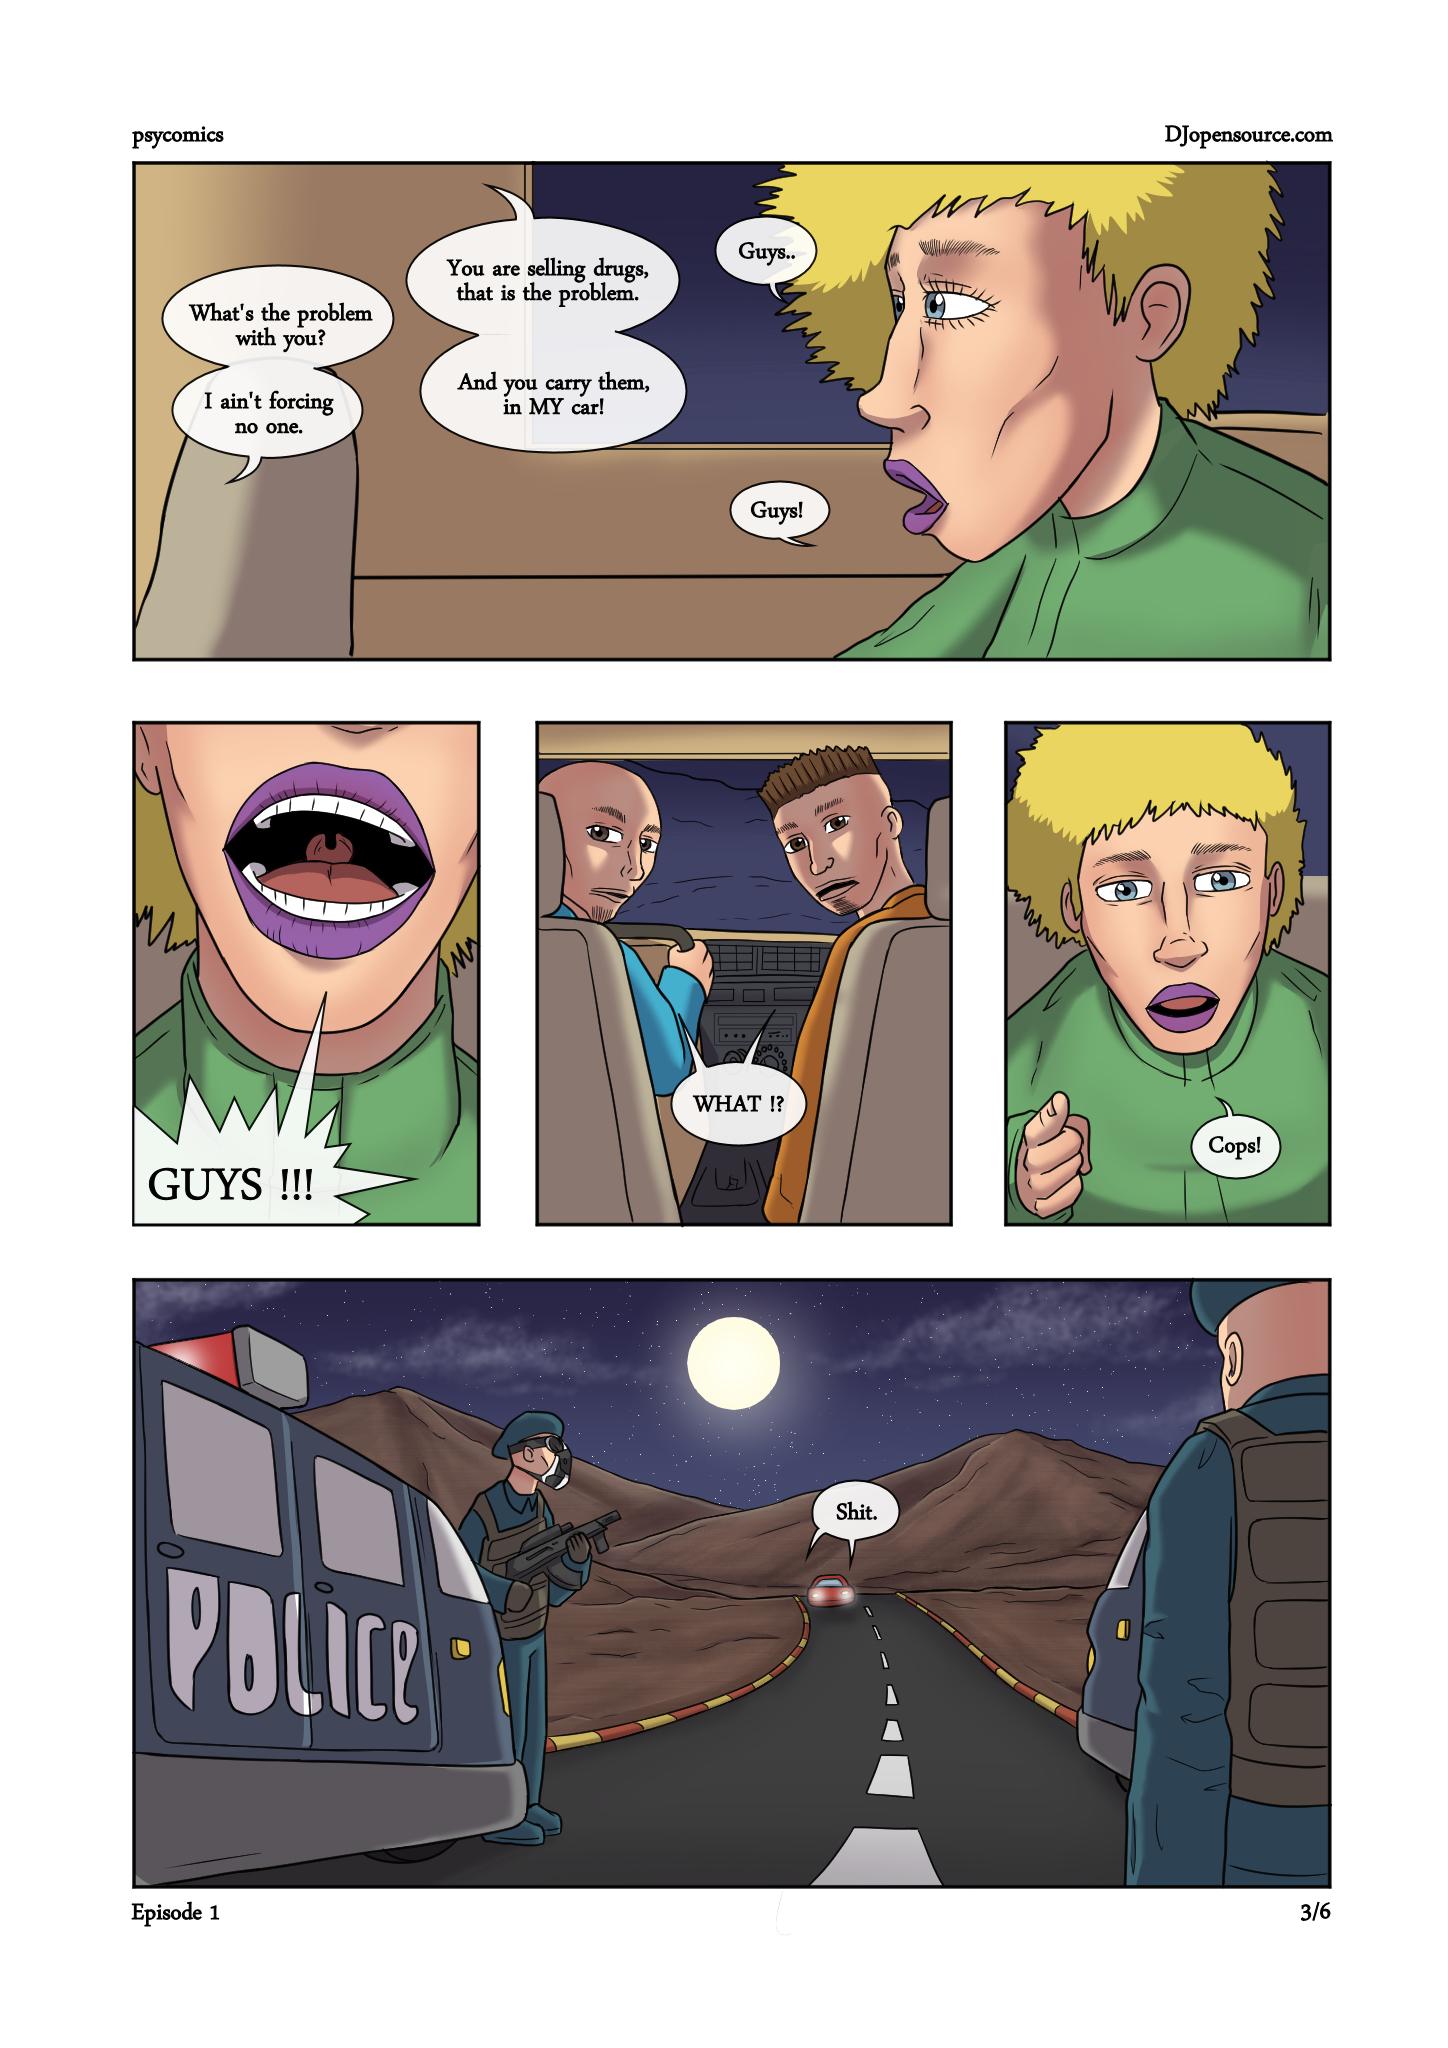 http://www.djopensource.com/psycomics/episode_1/psycomics_episode_1_page_3.jpg